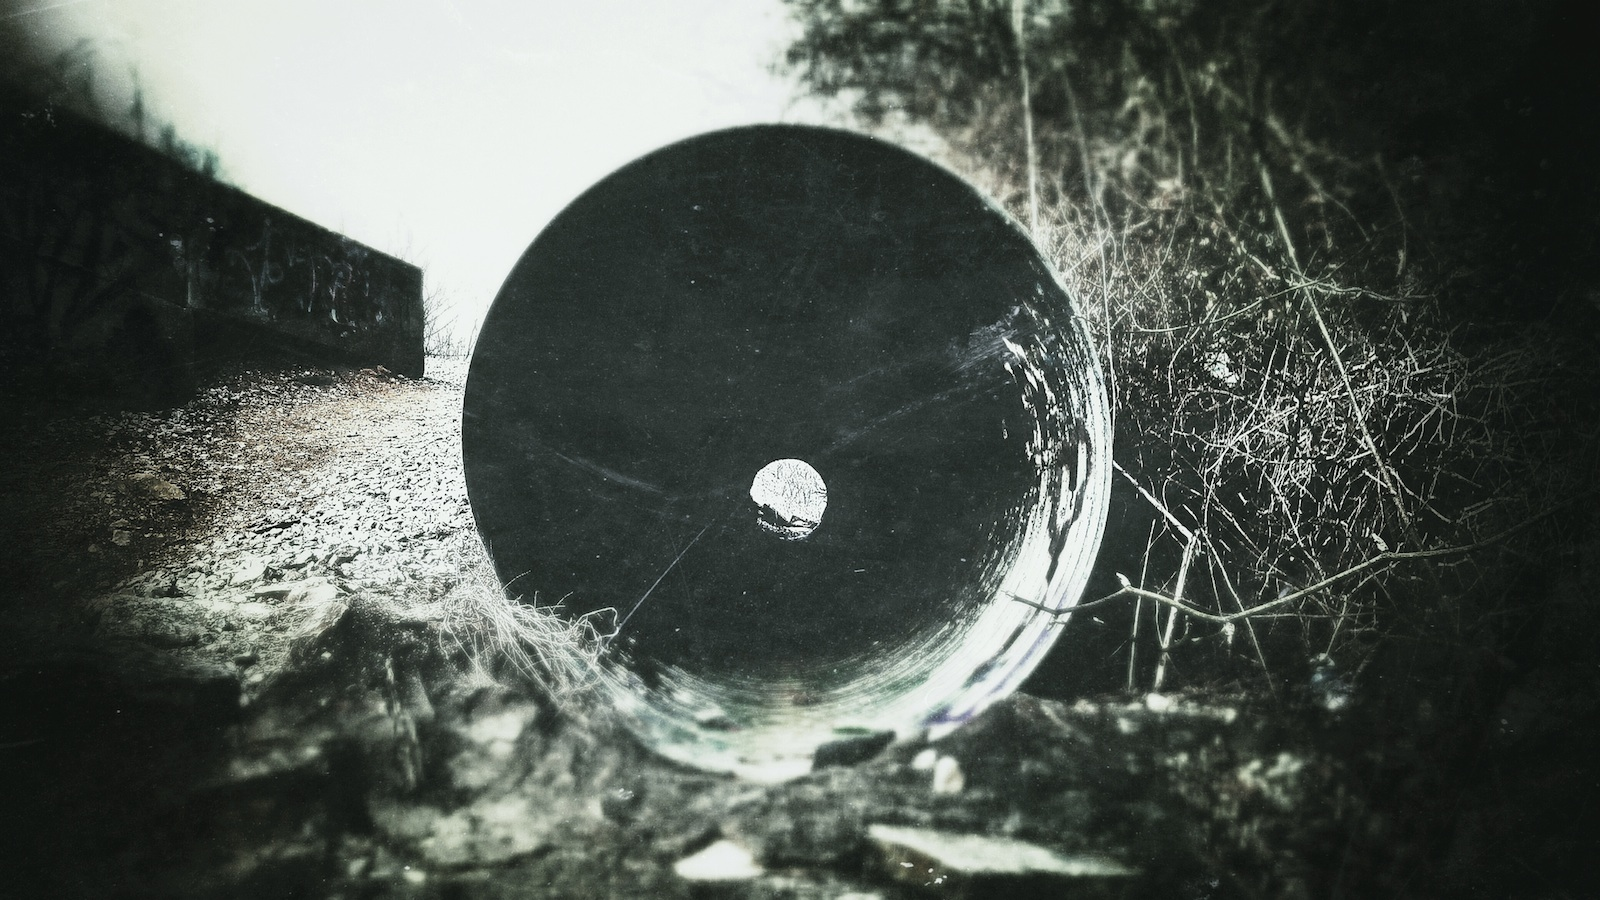 Looking Down A Barrel 2.jpg